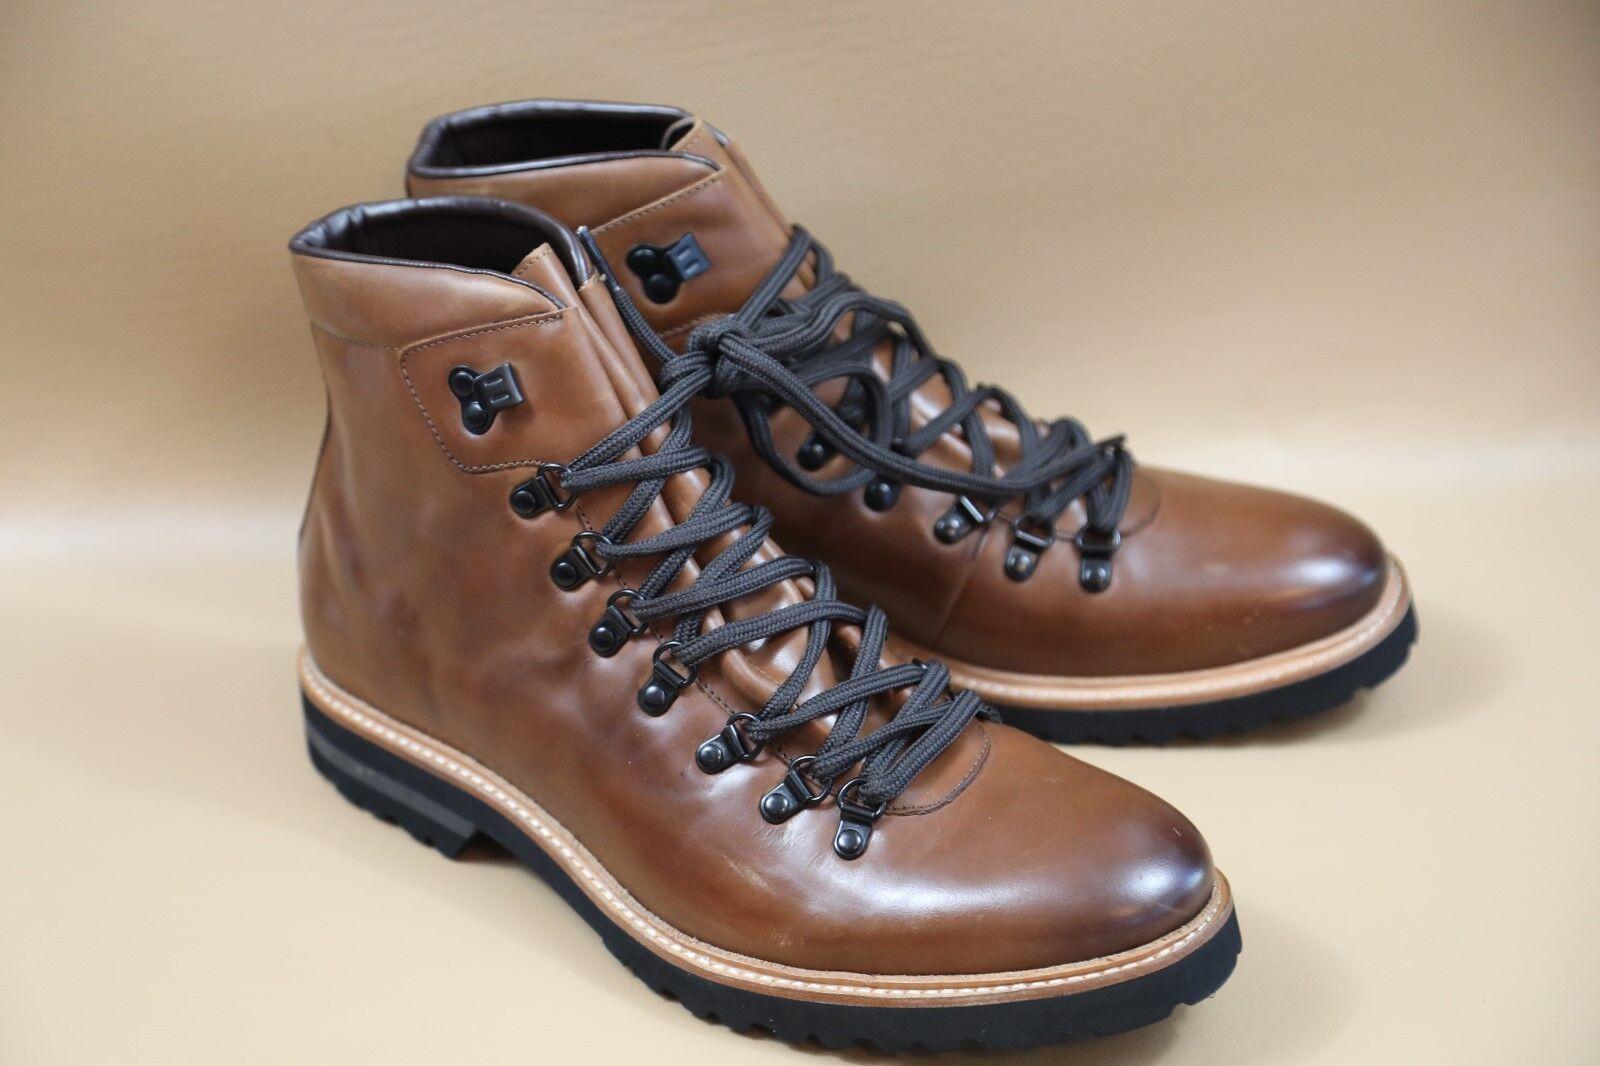 #12 Kenneth Cole Click Ur Heels Pelle Ankle Stivali Taglia 11 M  225 retail